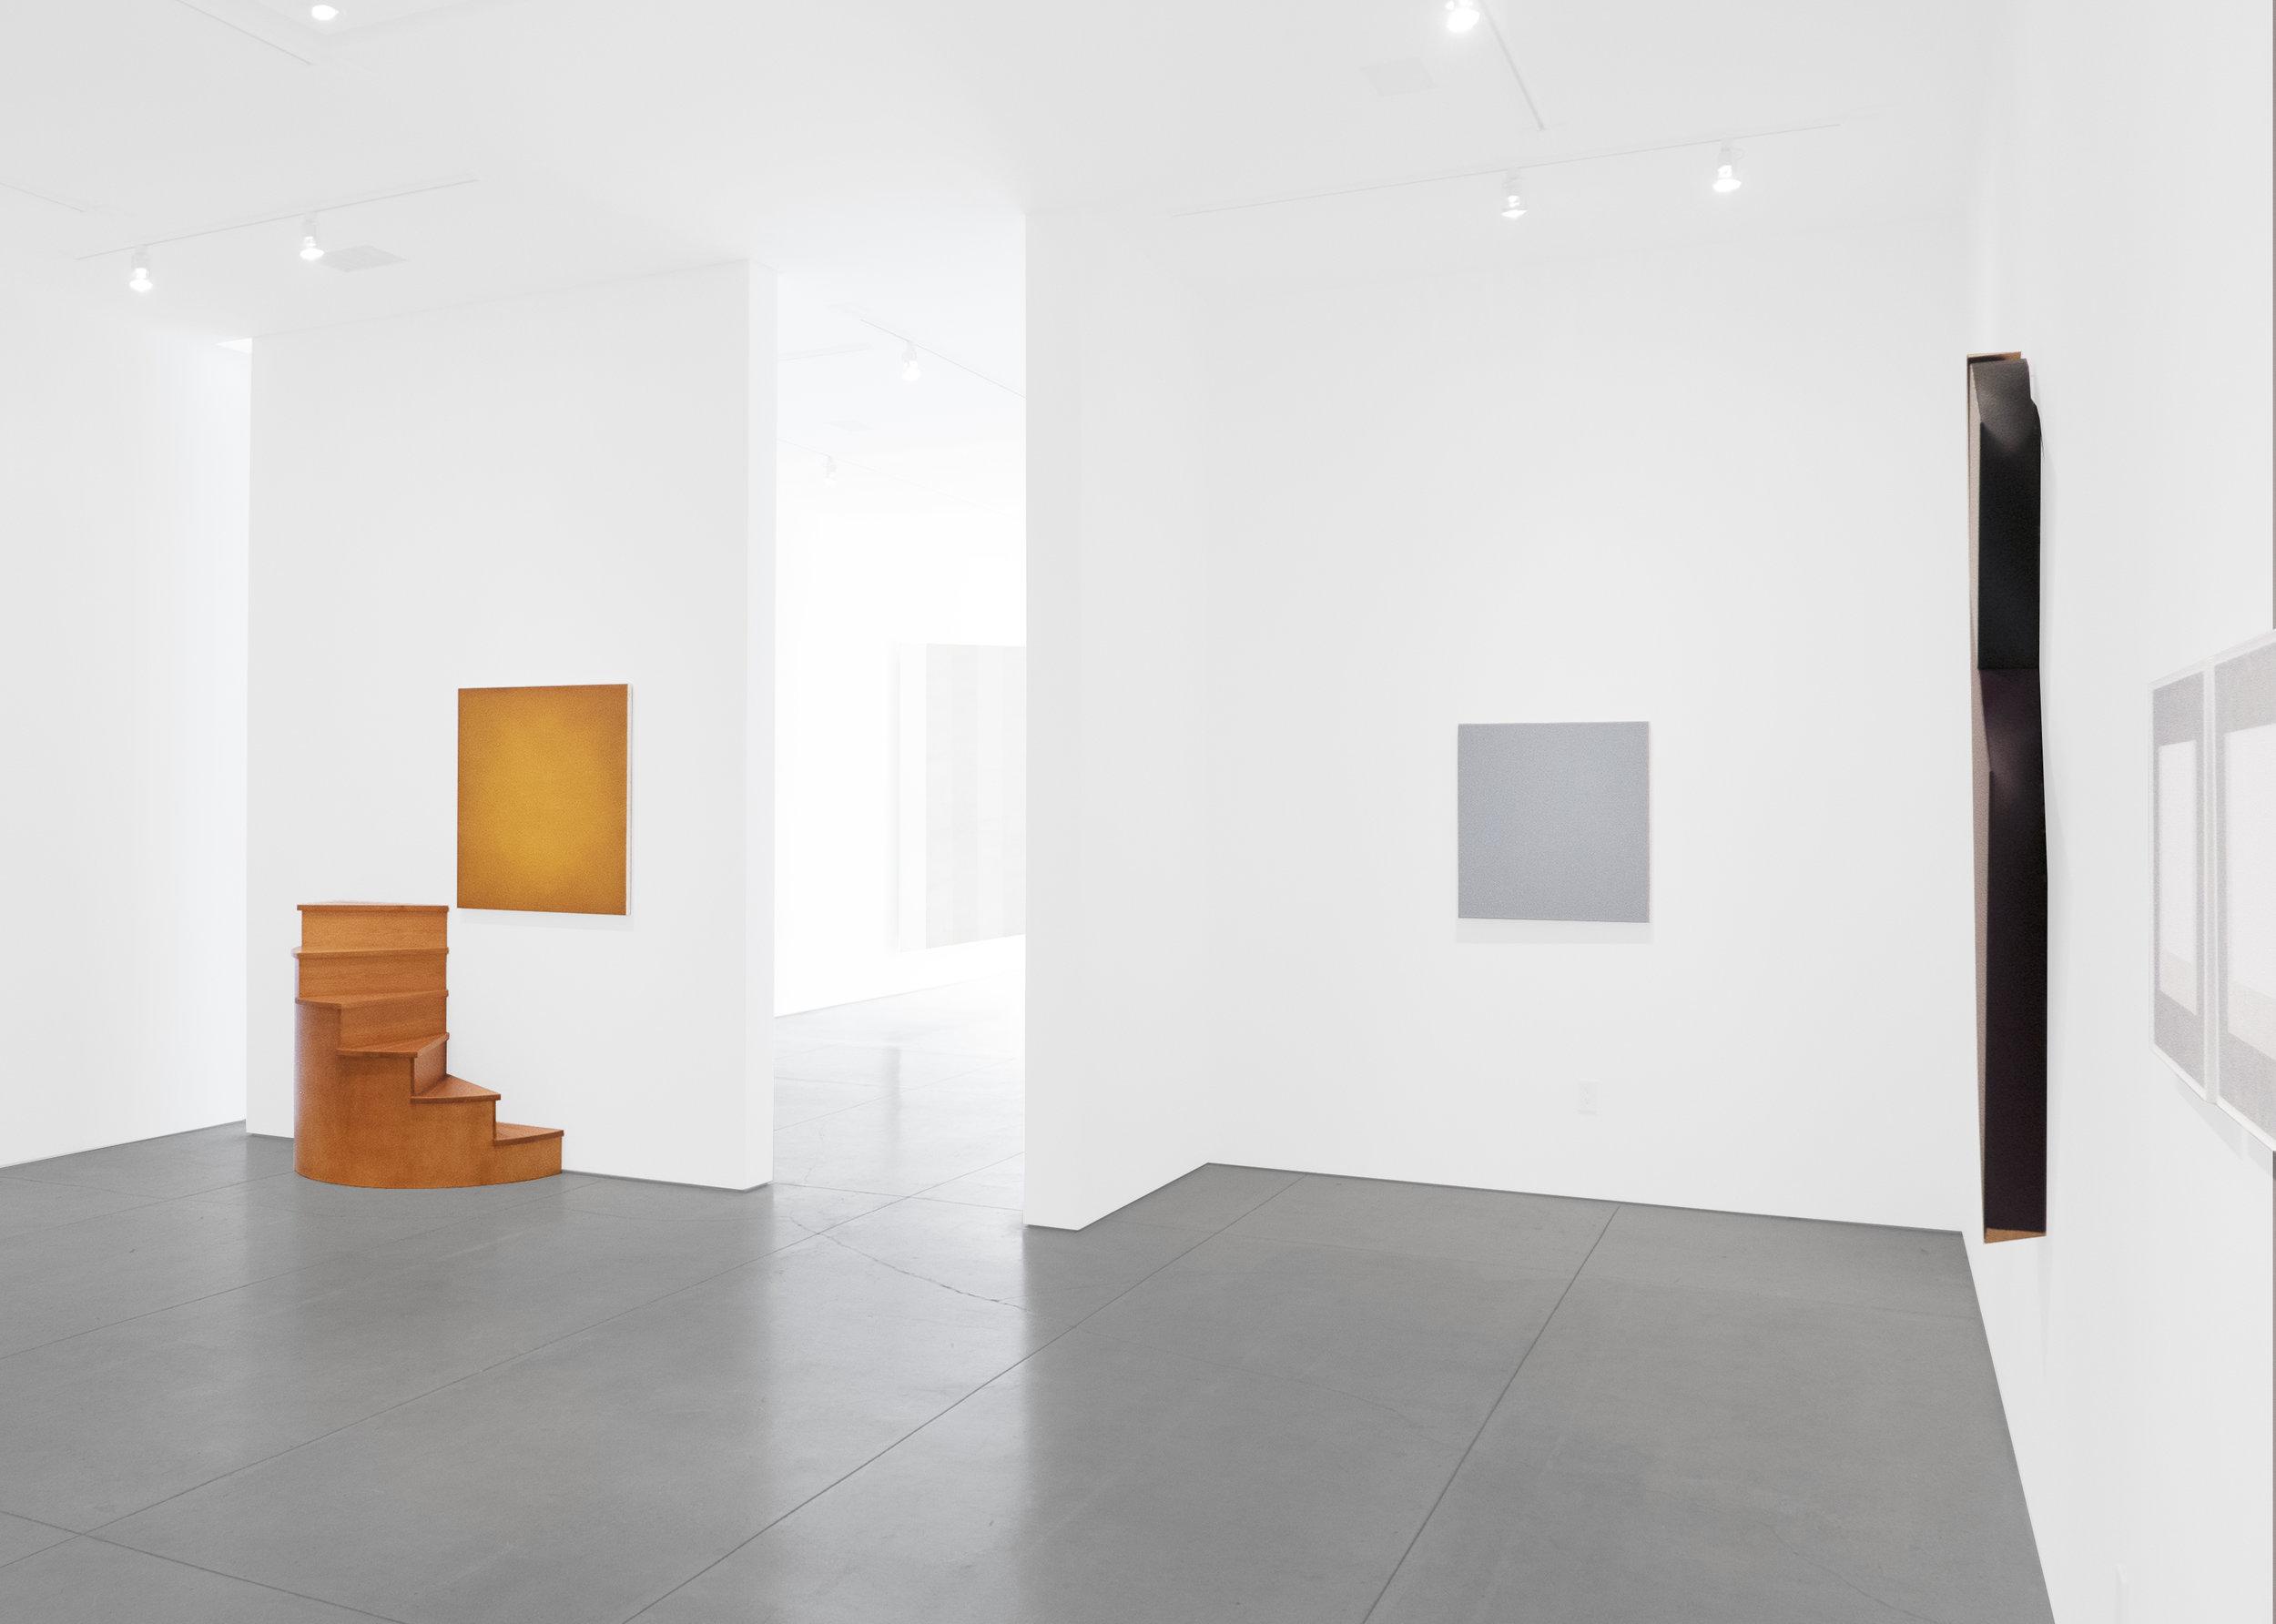 25 Years_Peter Blake Gallery_2019_Installation View_22.jpg